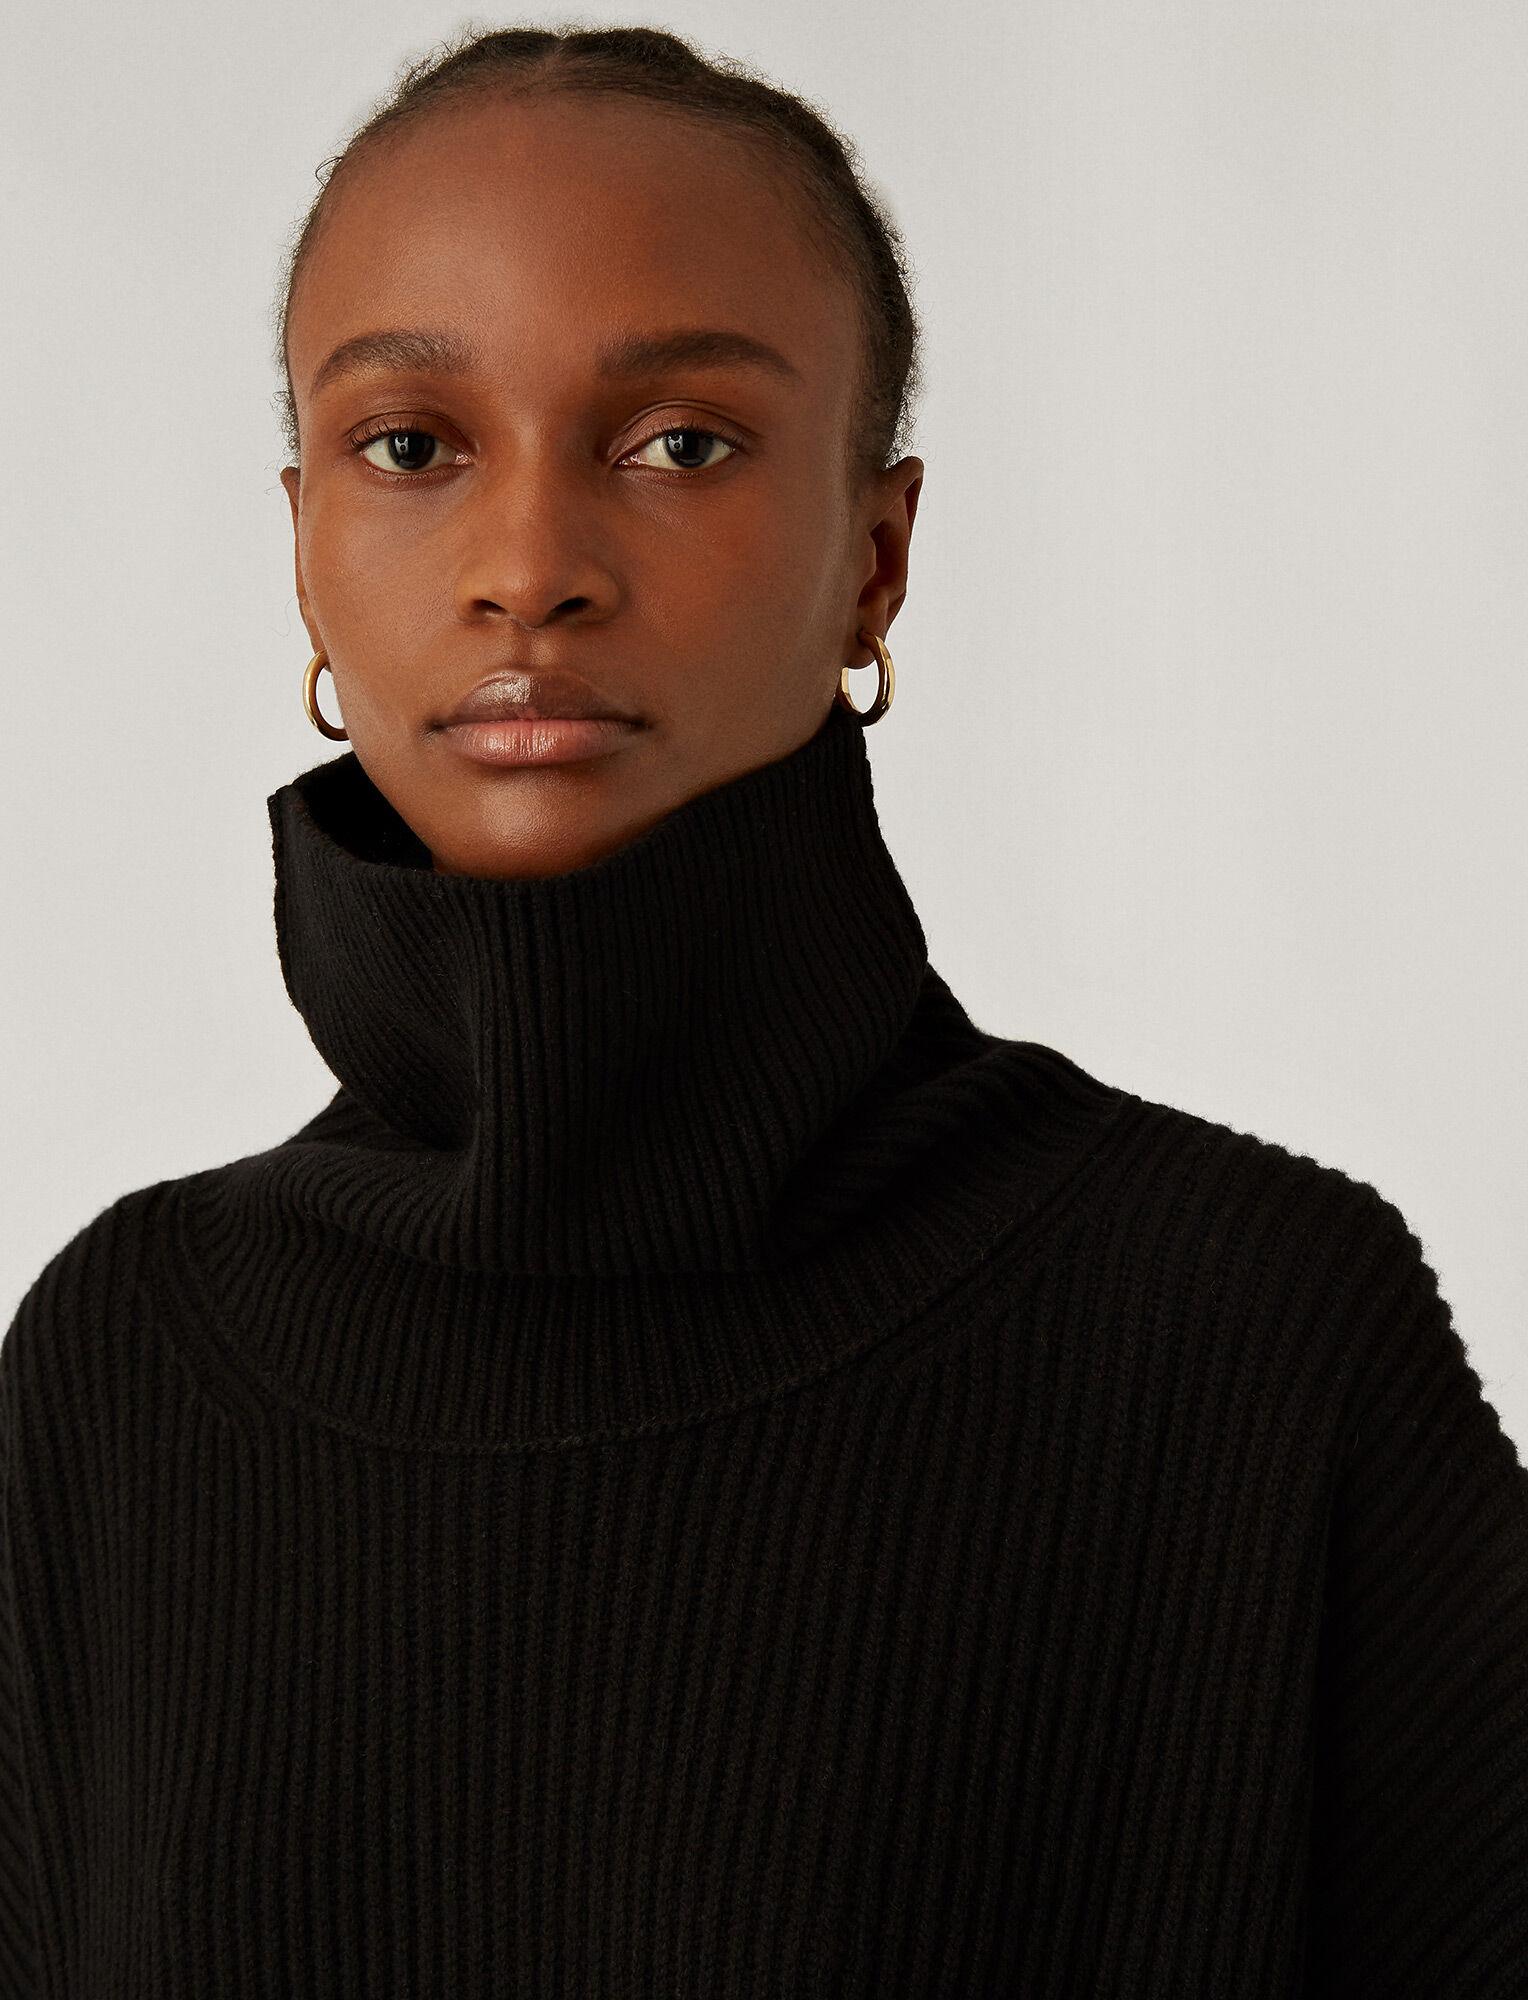 Joseph, Poncho Cardigan Stitch Knit, in Black